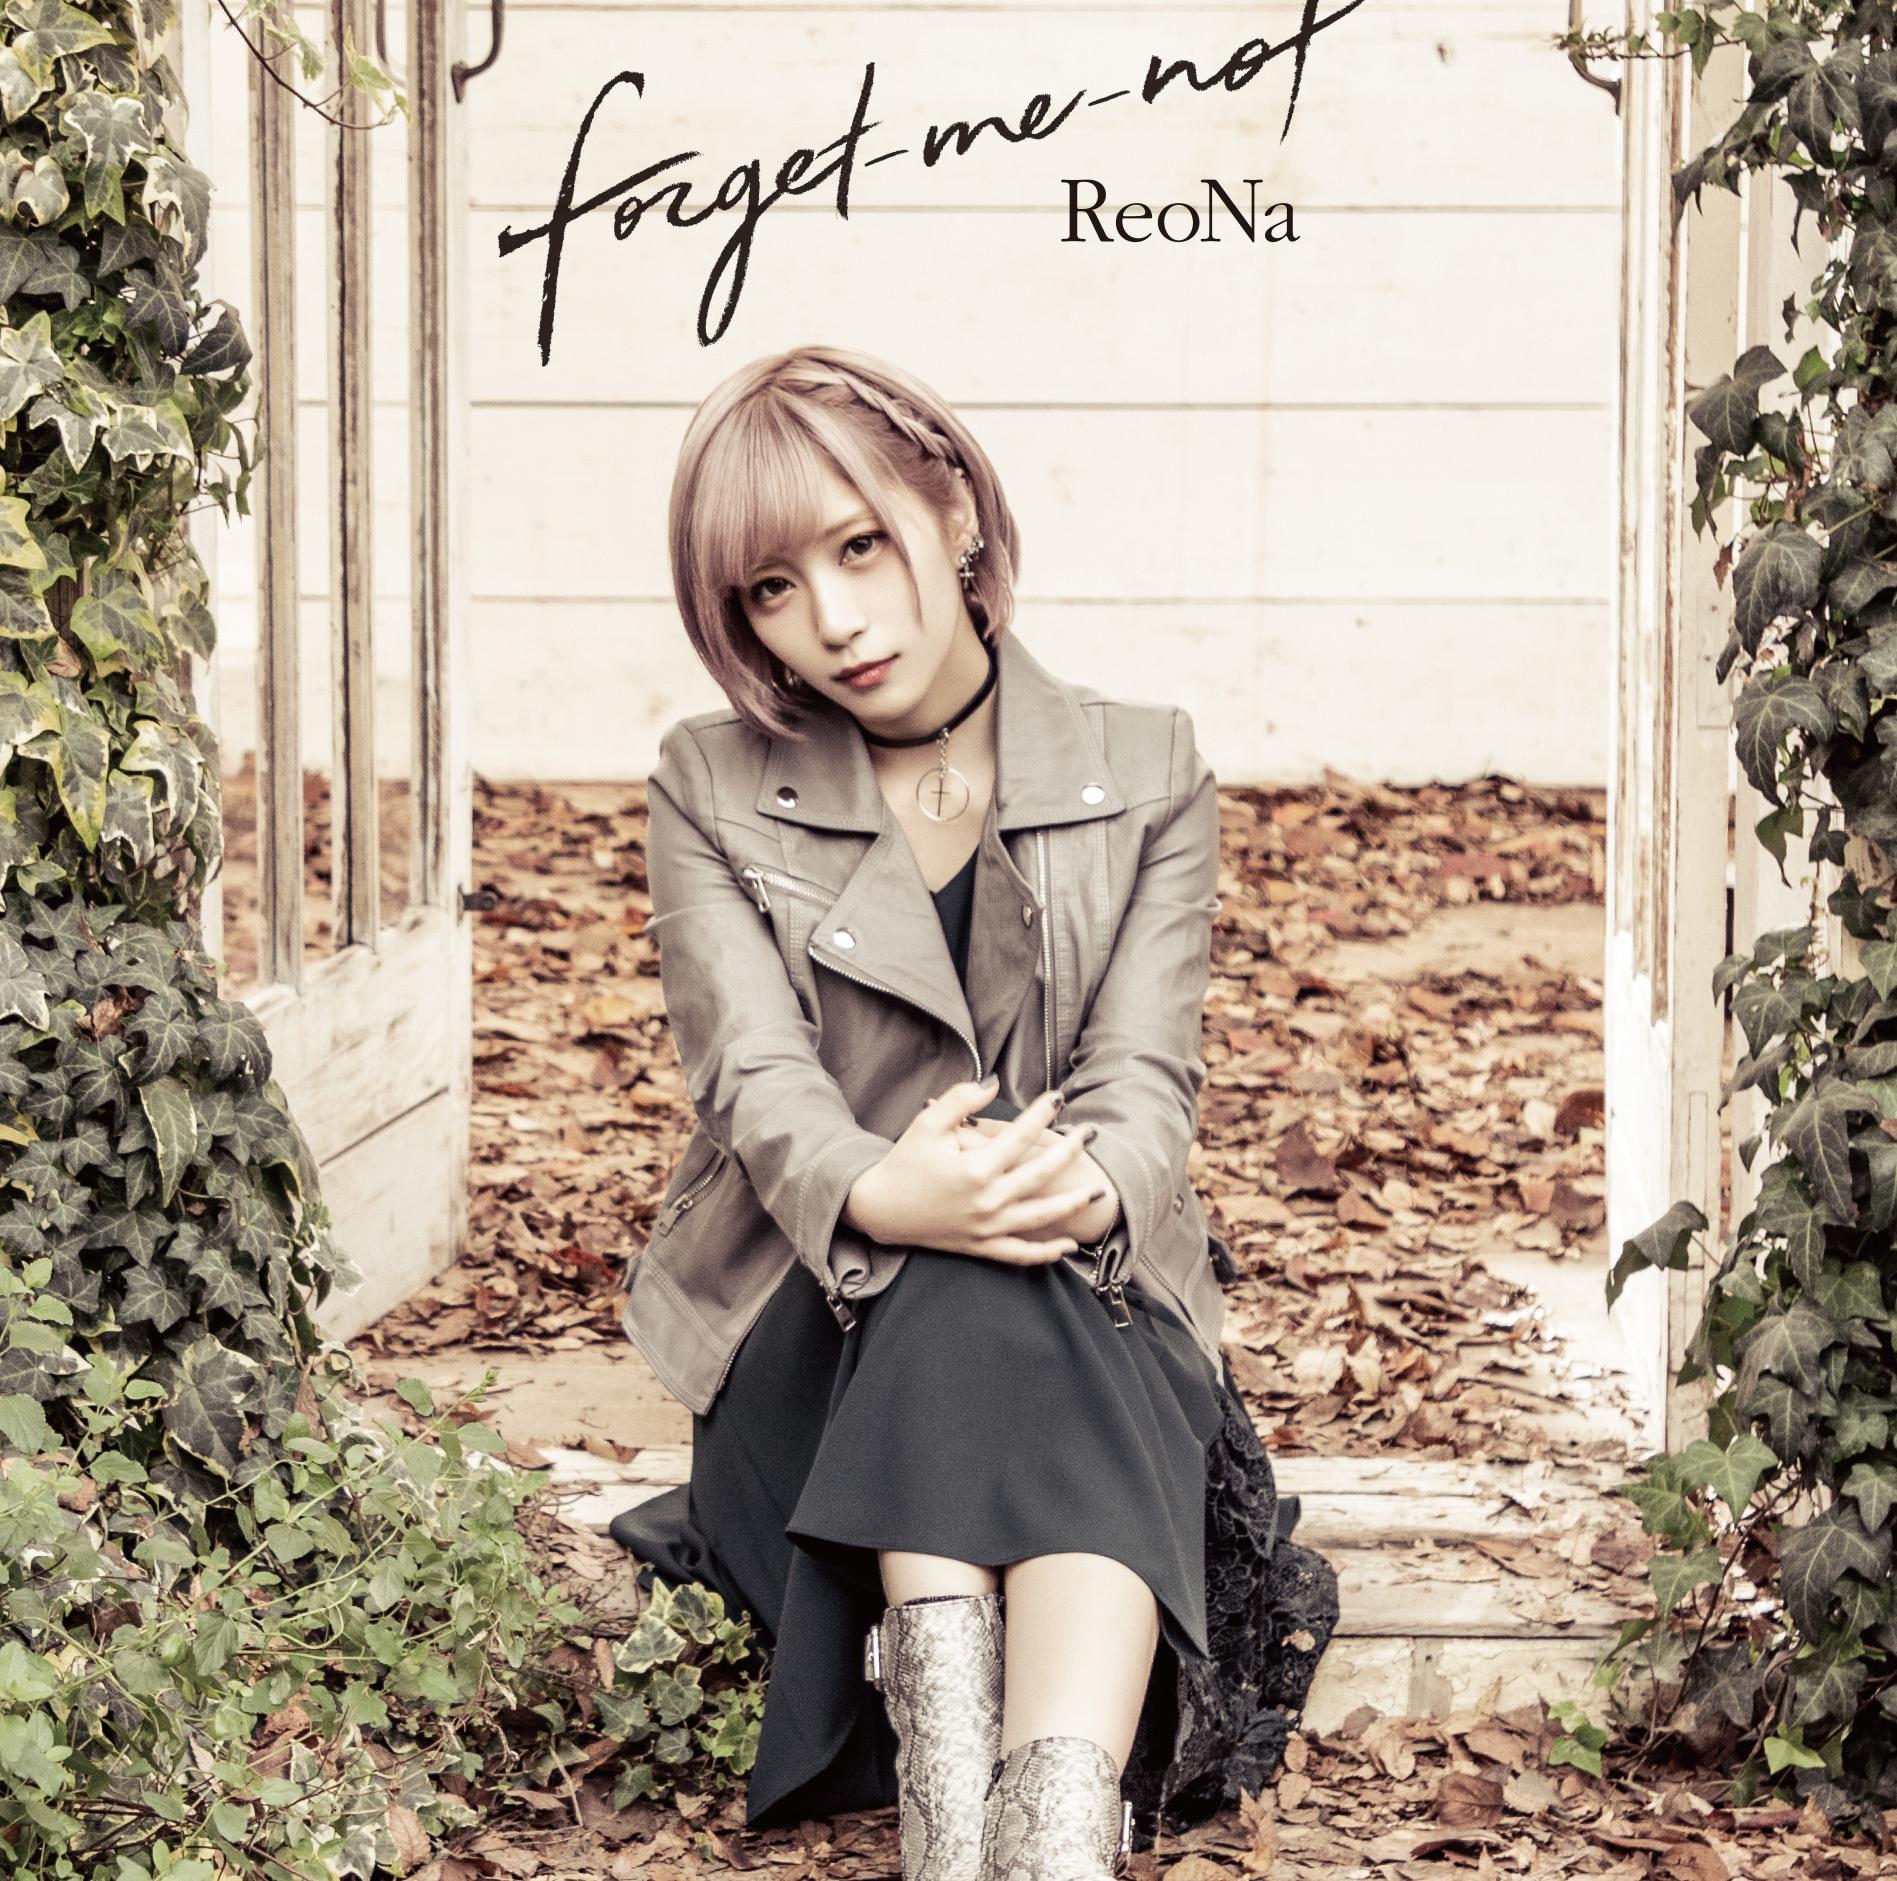 「forget-me-not」初回限定盤ジャケット